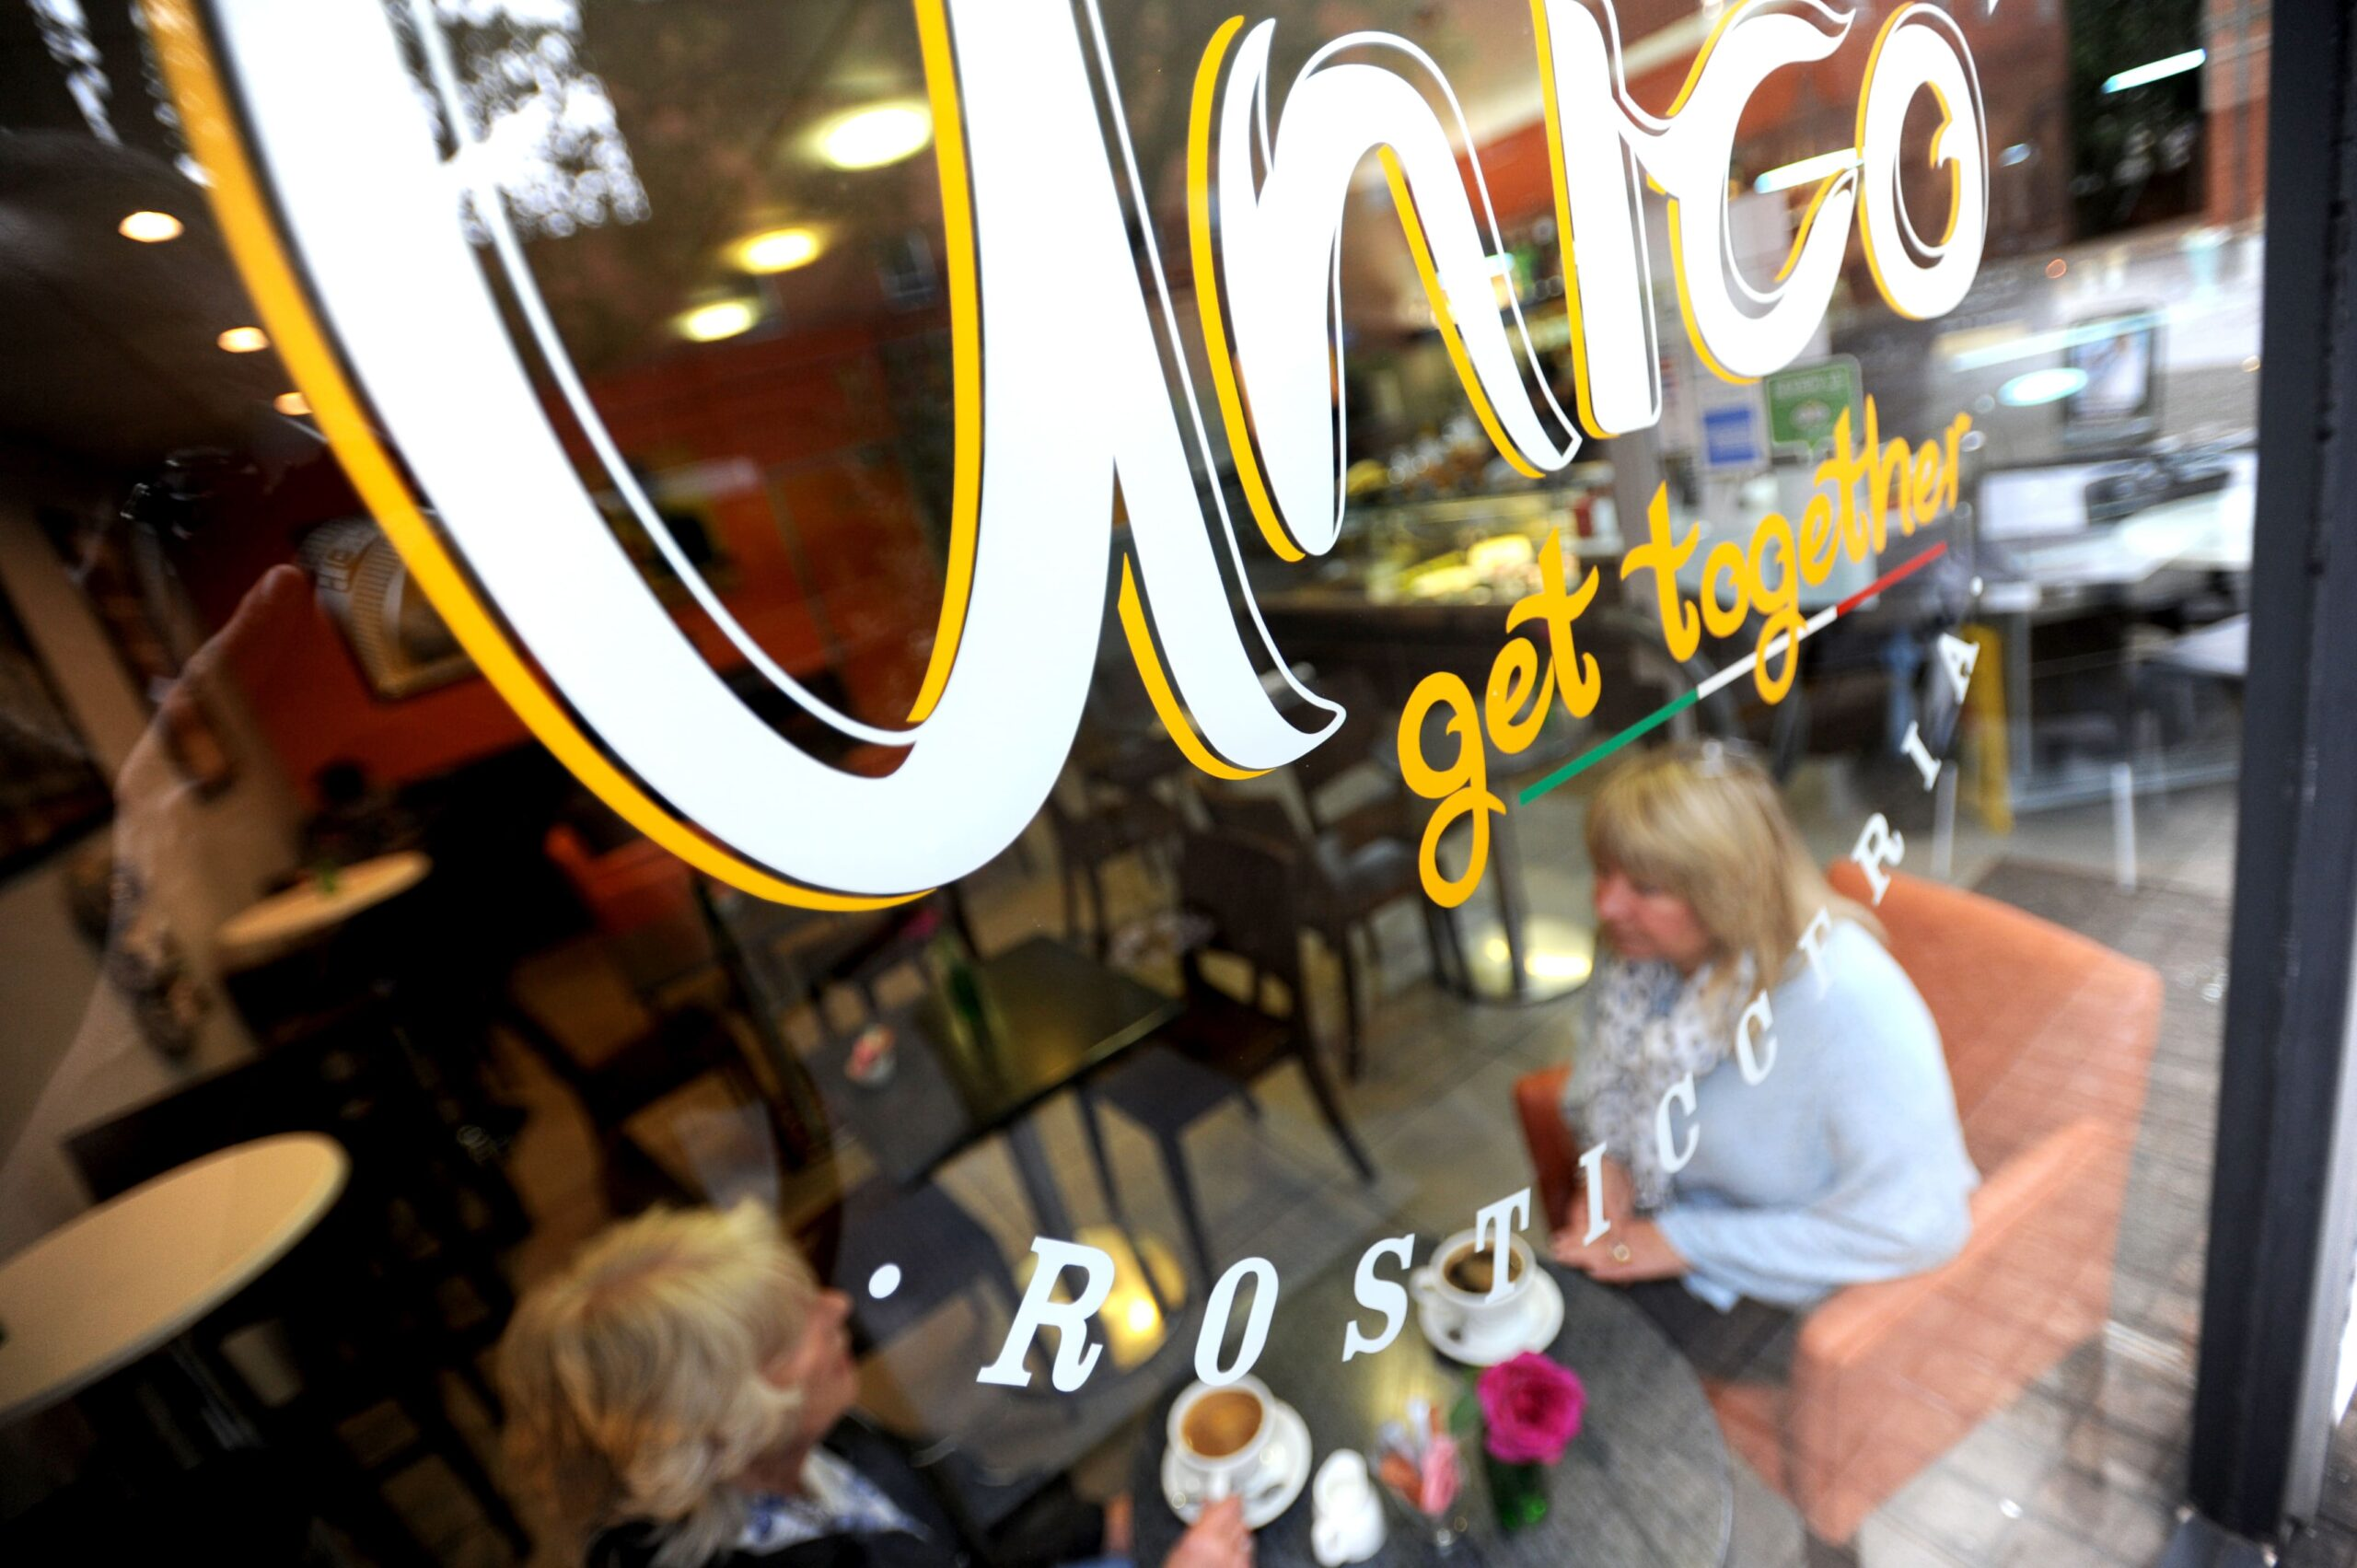 breakfast cafe in lincoln